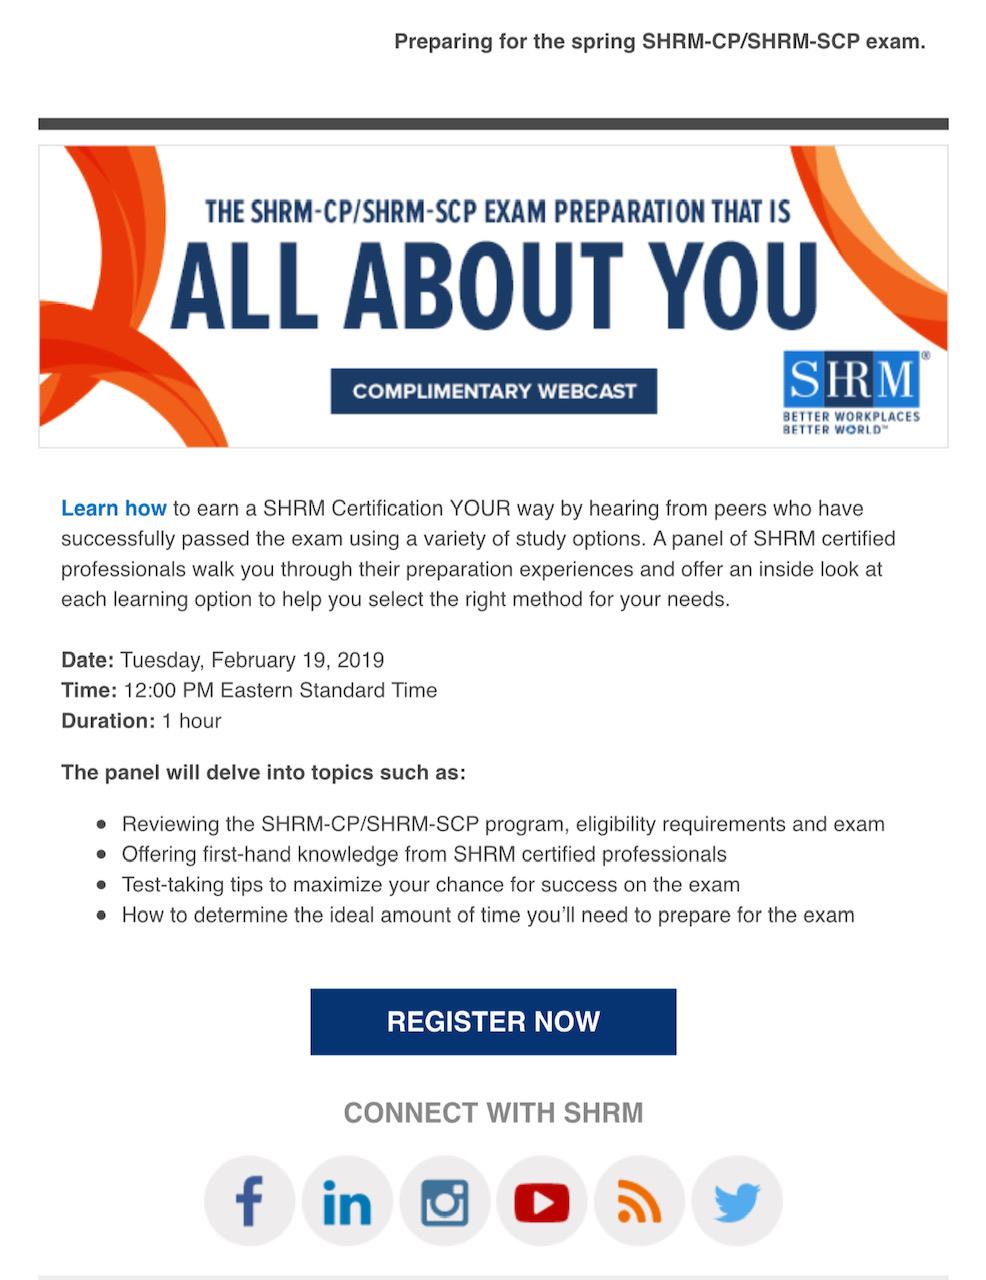 Lehman Chapter Shrm Spring 2019 Shrm Cpshrm Scp Exam Info Session